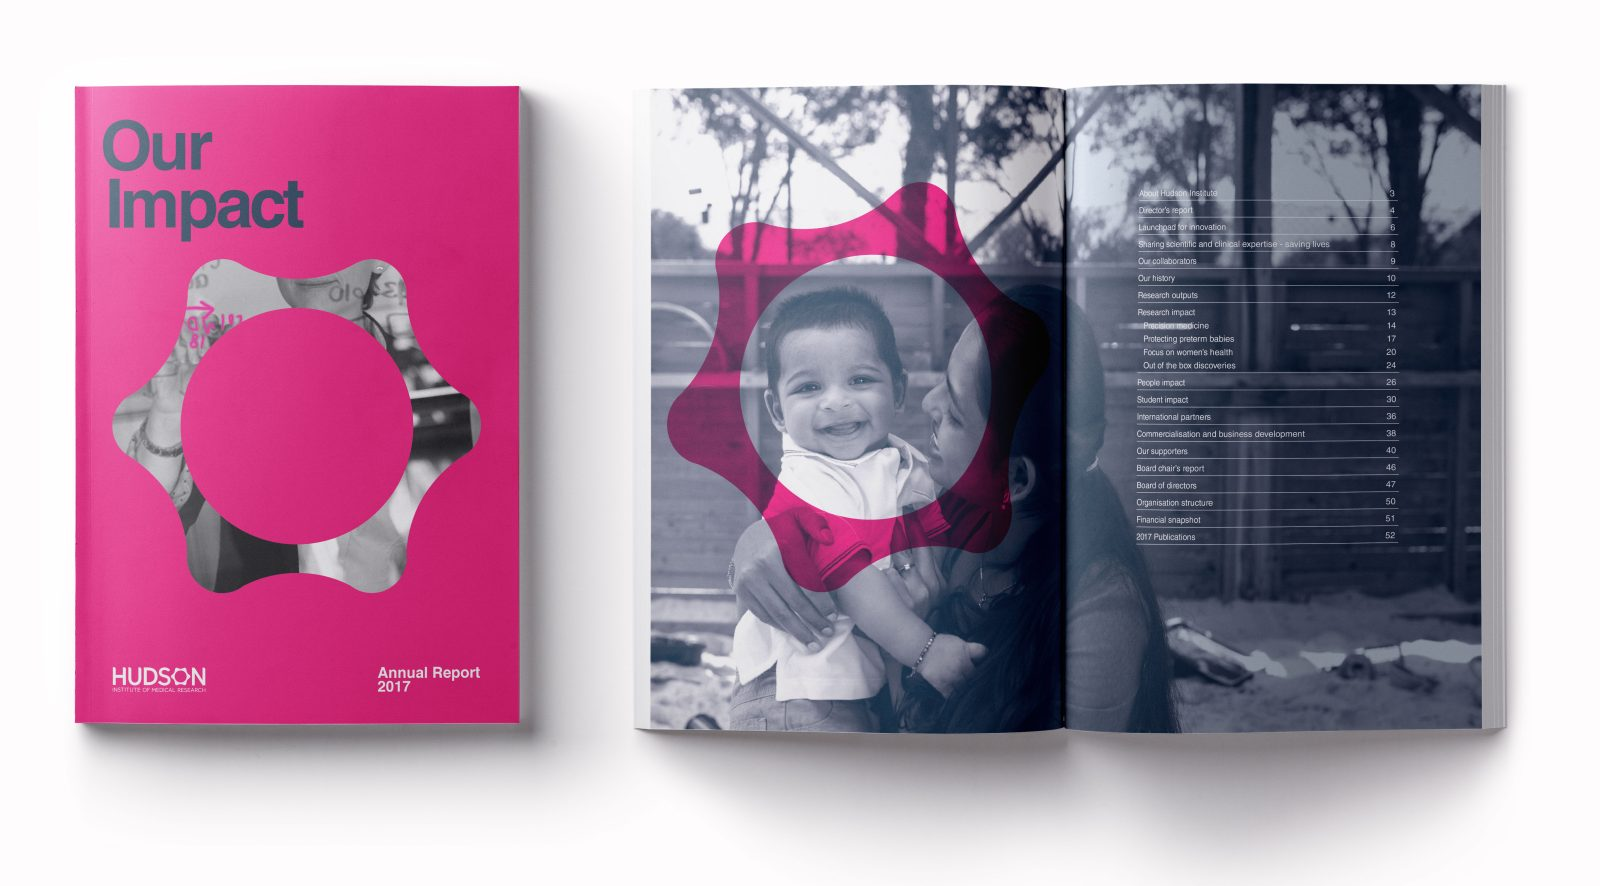 Hudson Institure annual report cover